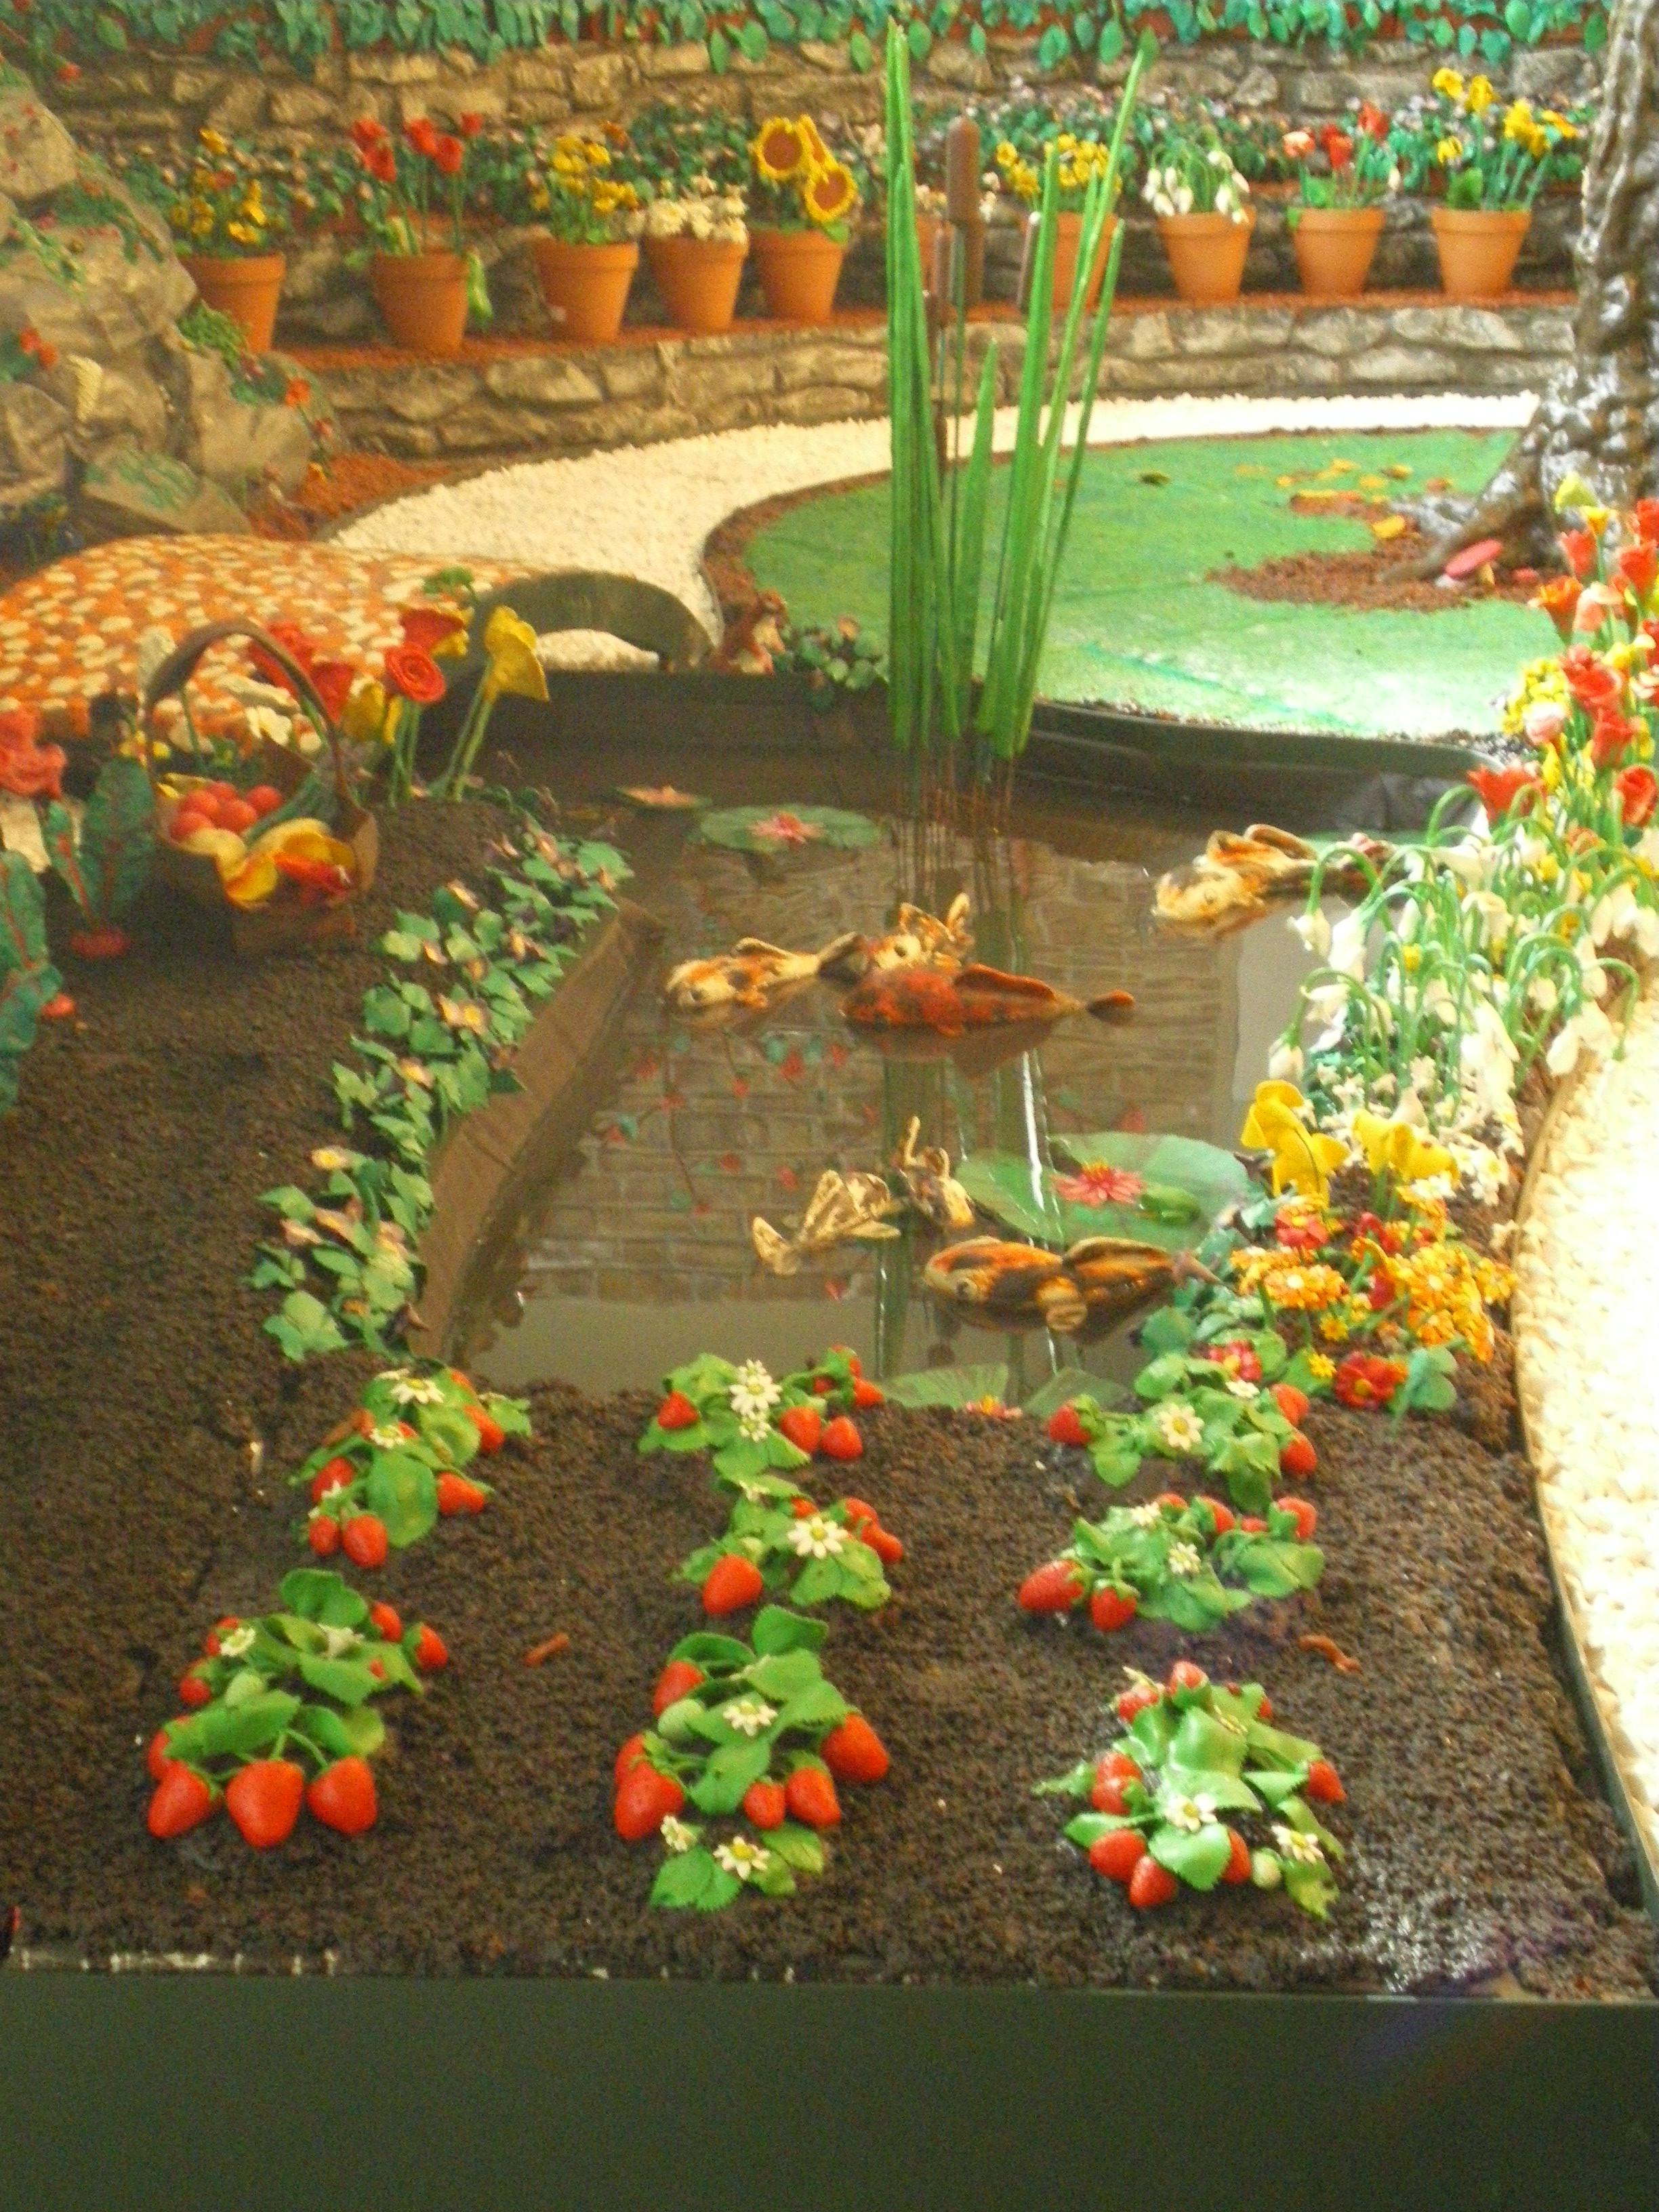 Plasticine Fruit Garden